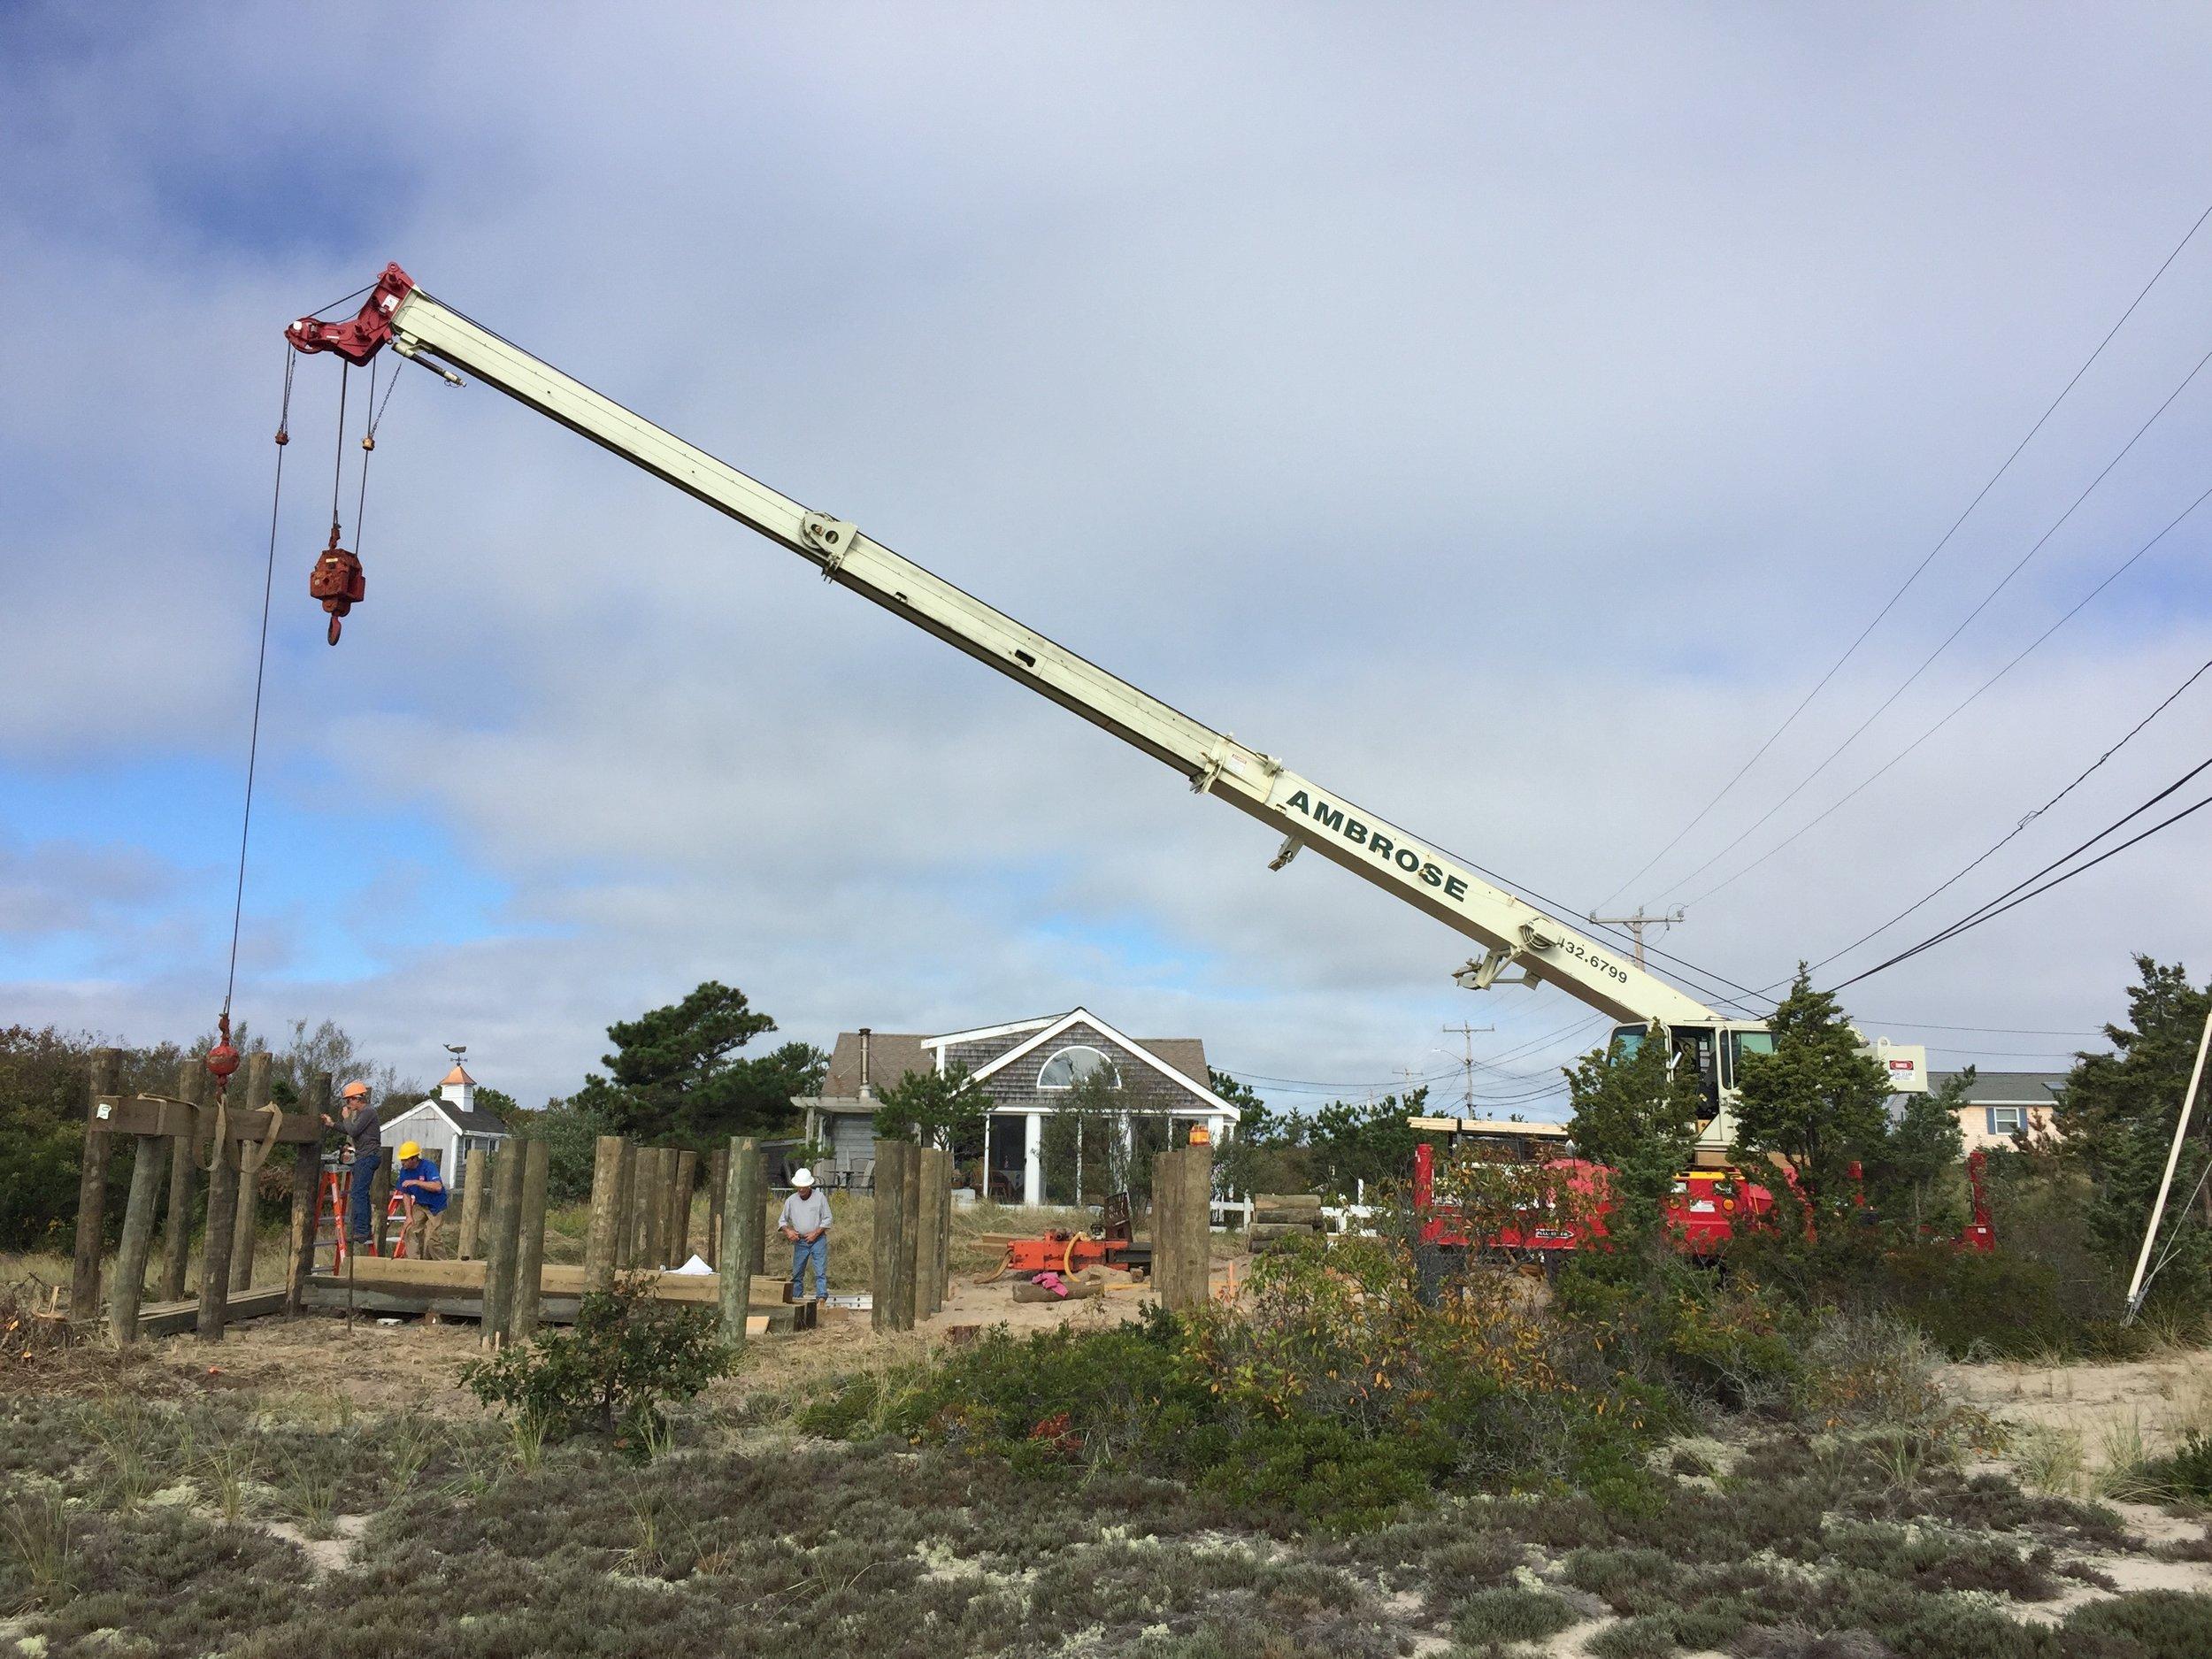 Ambrose Homes crane driving piles